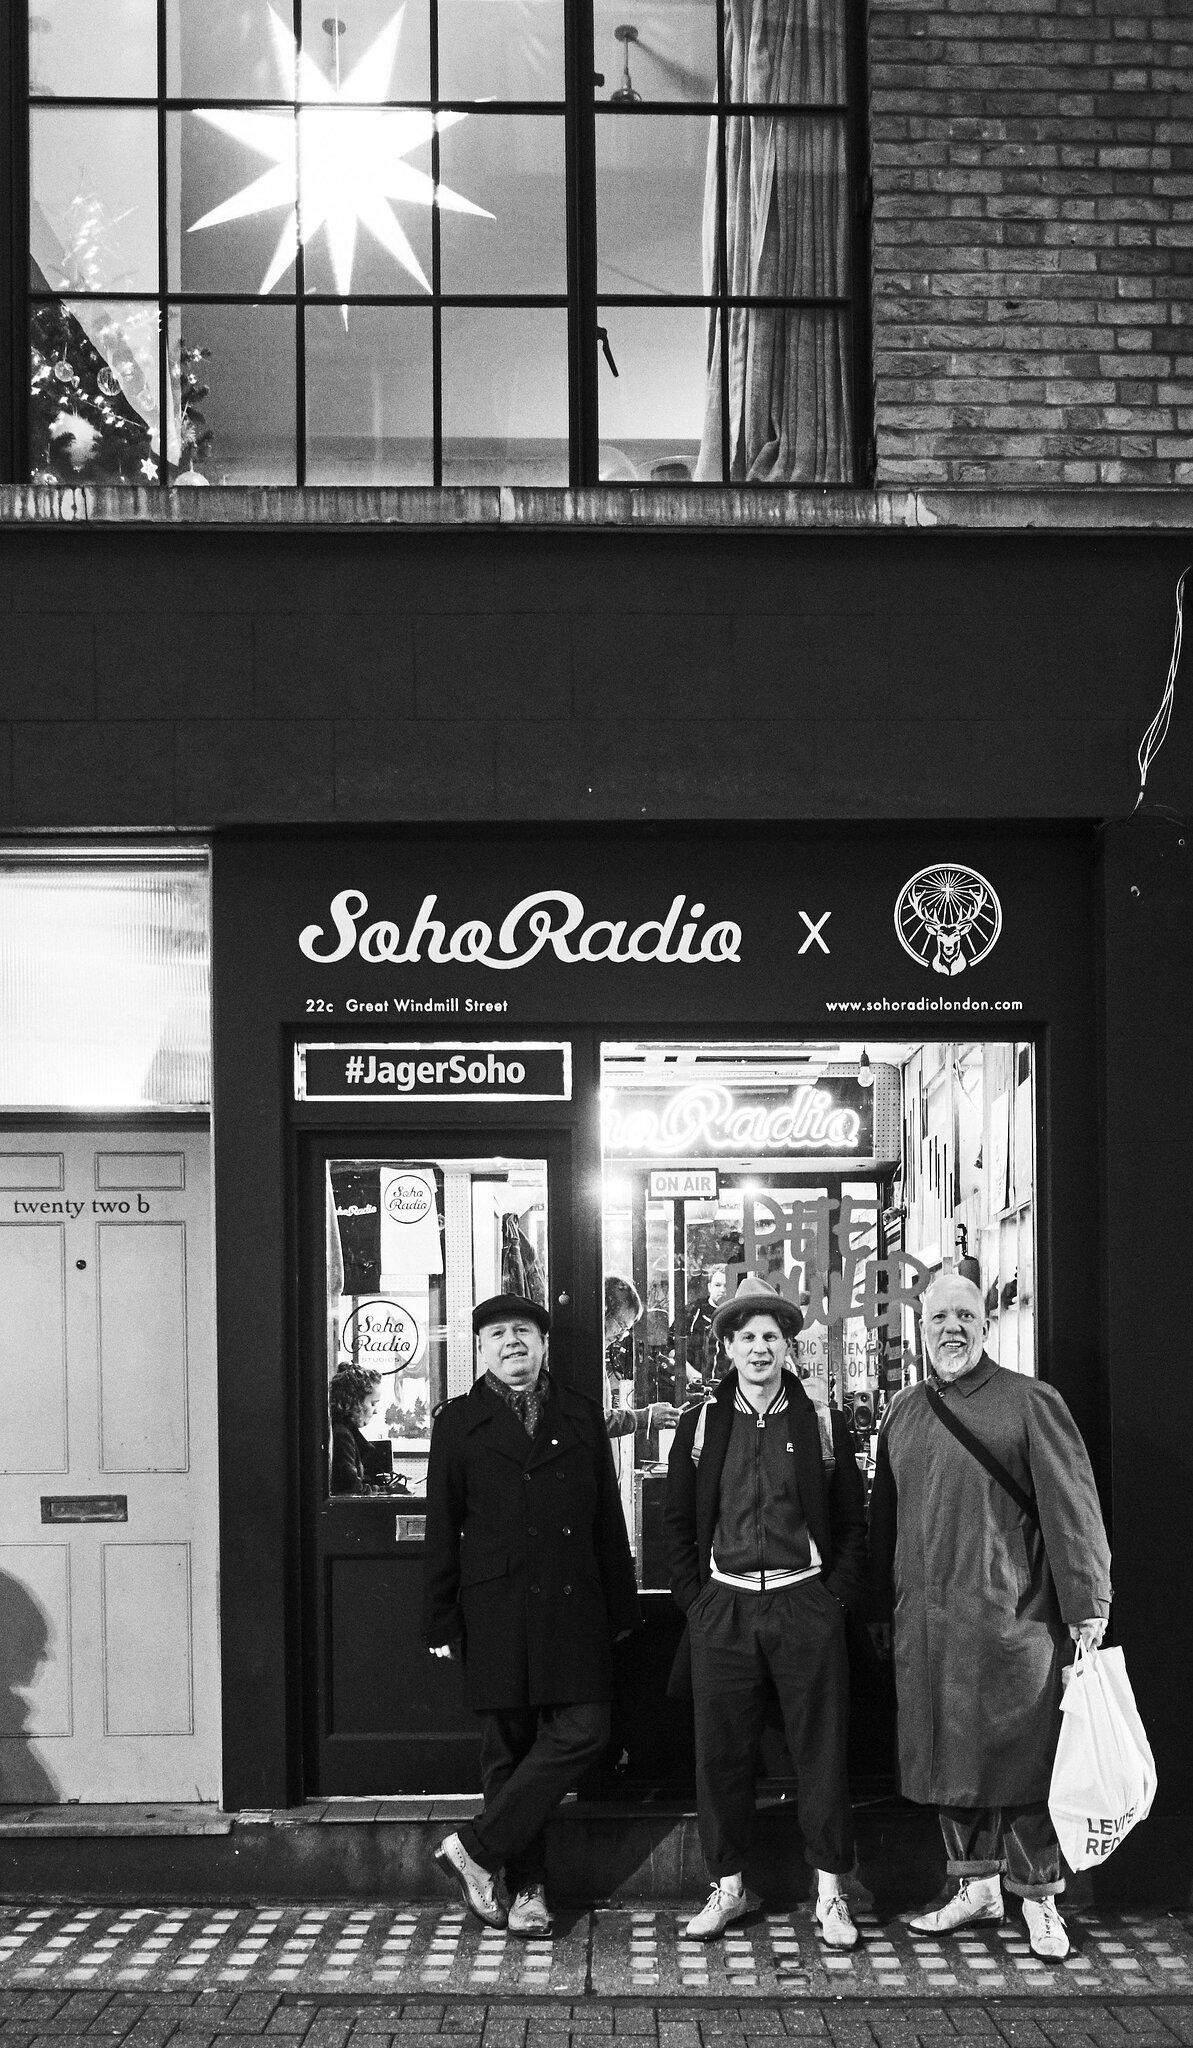 Jocks & Nerds Radio Show images